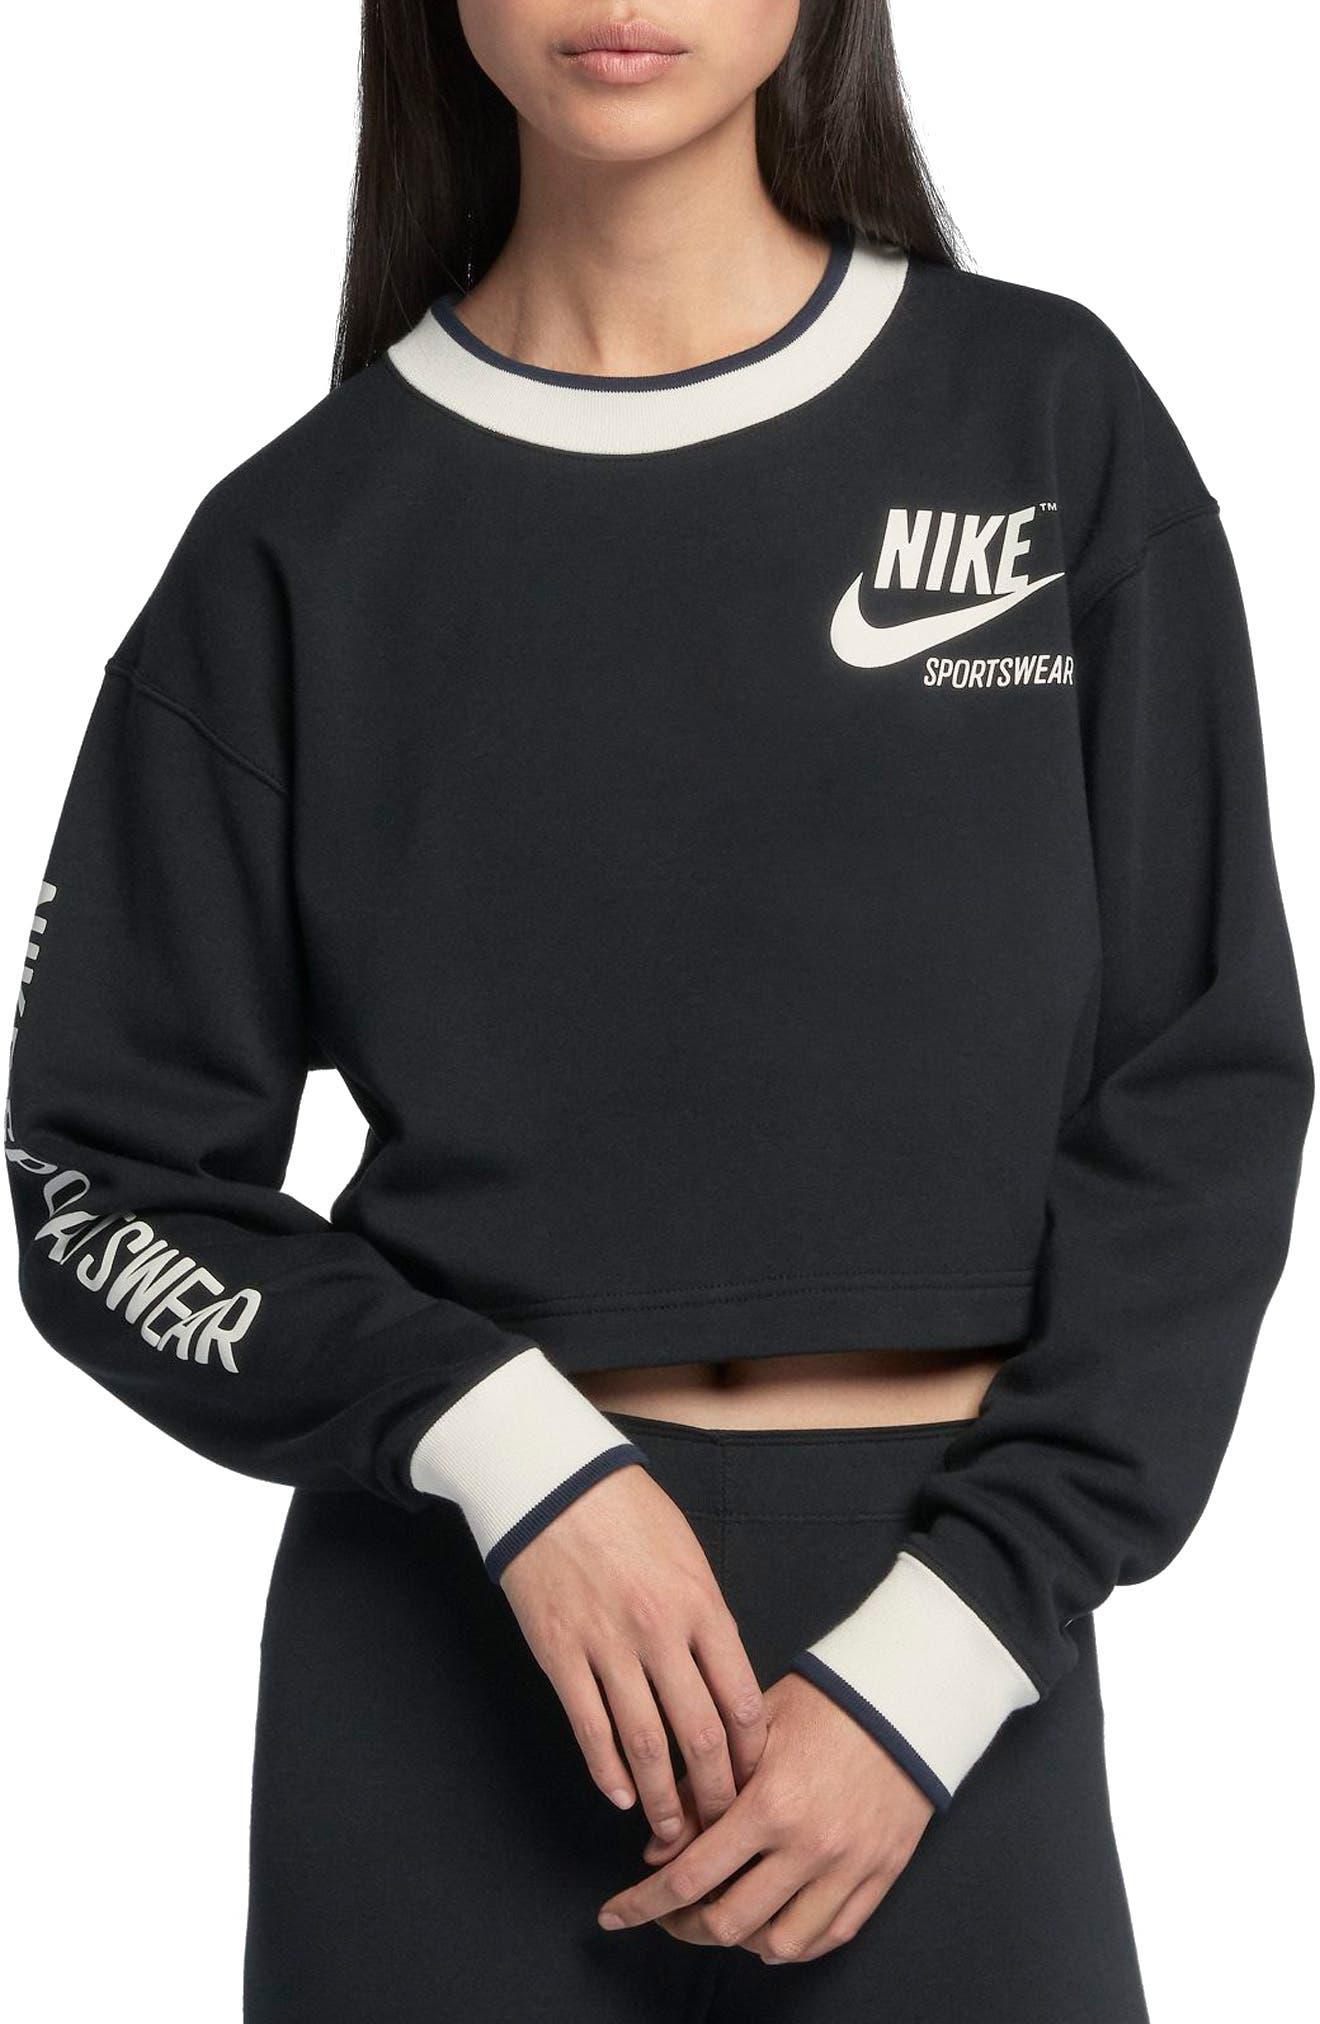 Reversible Crop Sweatshirt, Main, color, 010